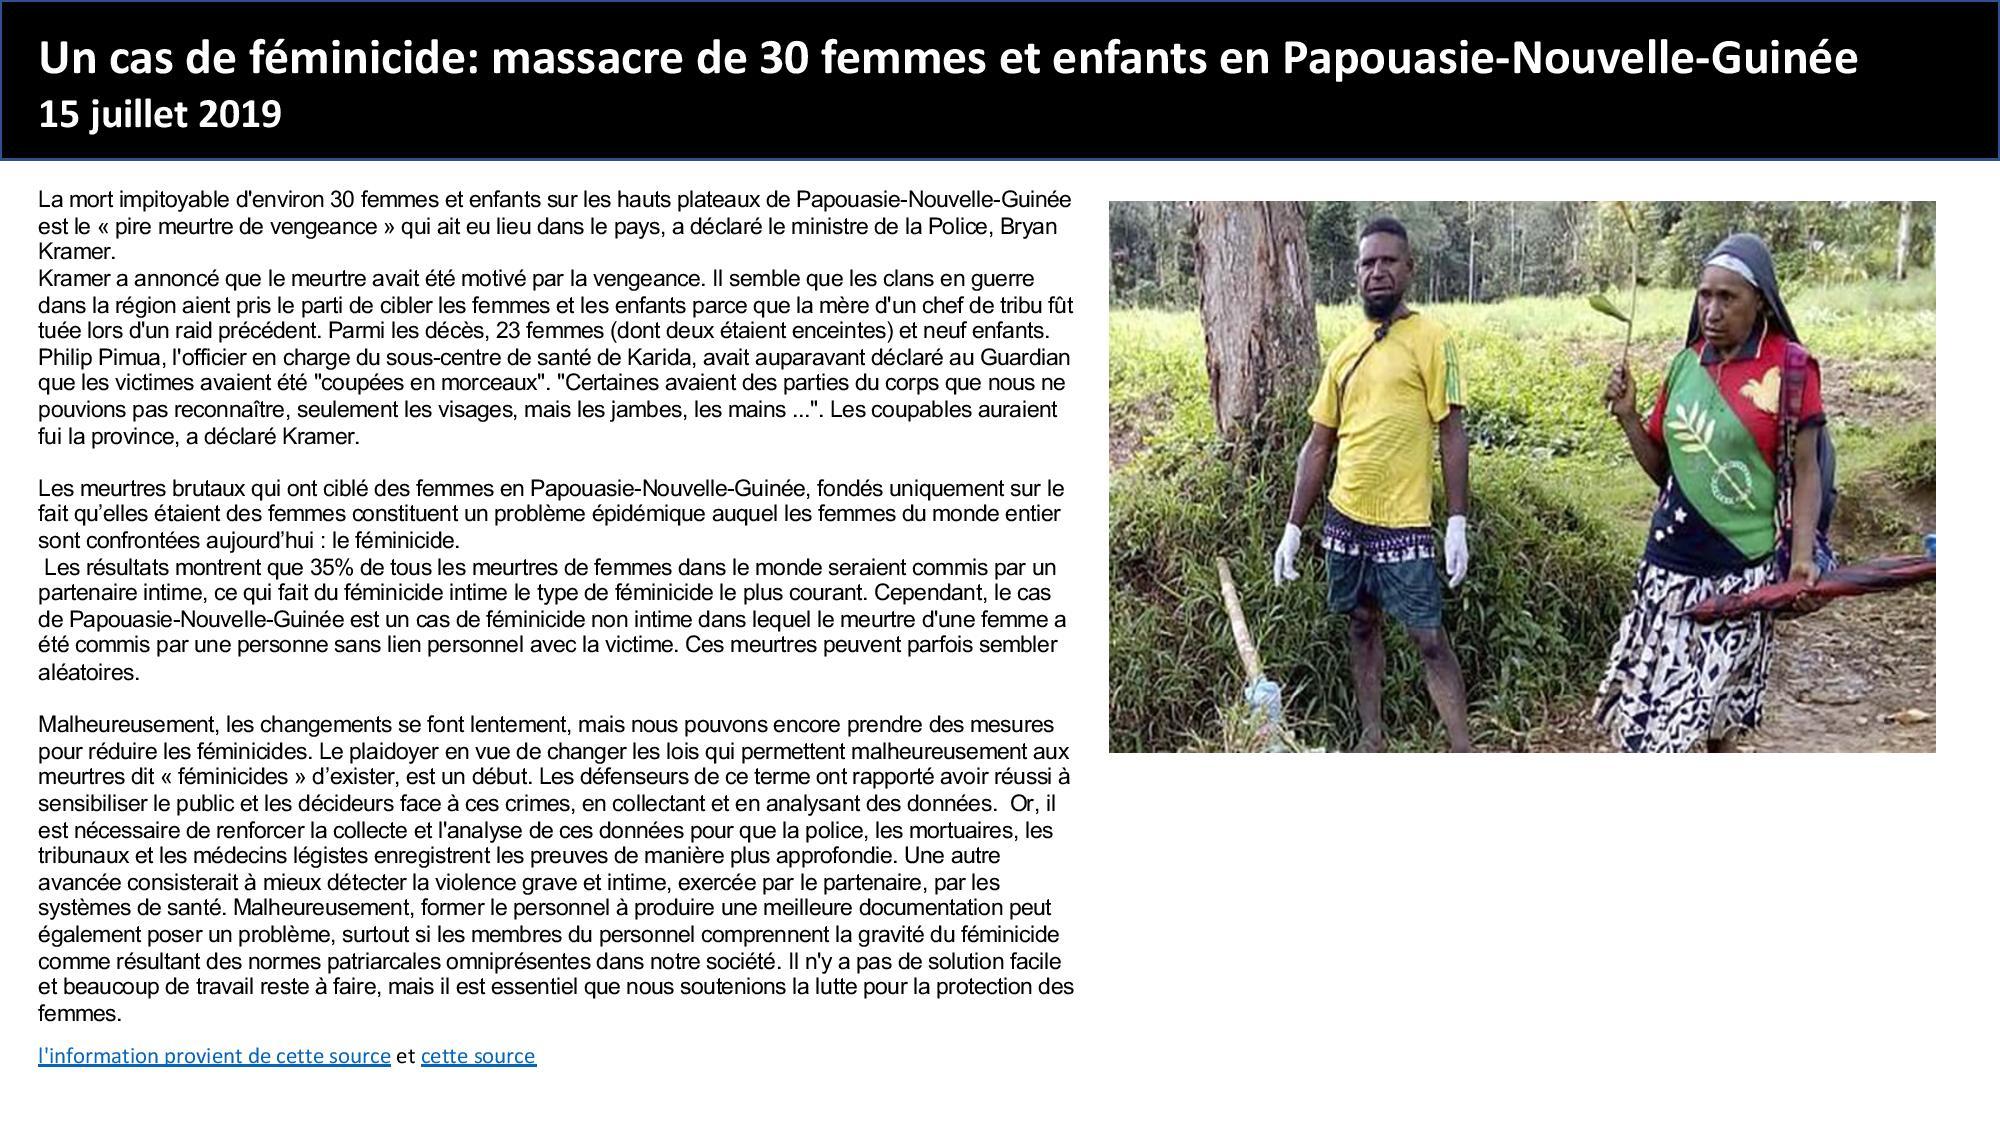 Papouasie new Guinea 15.07.19